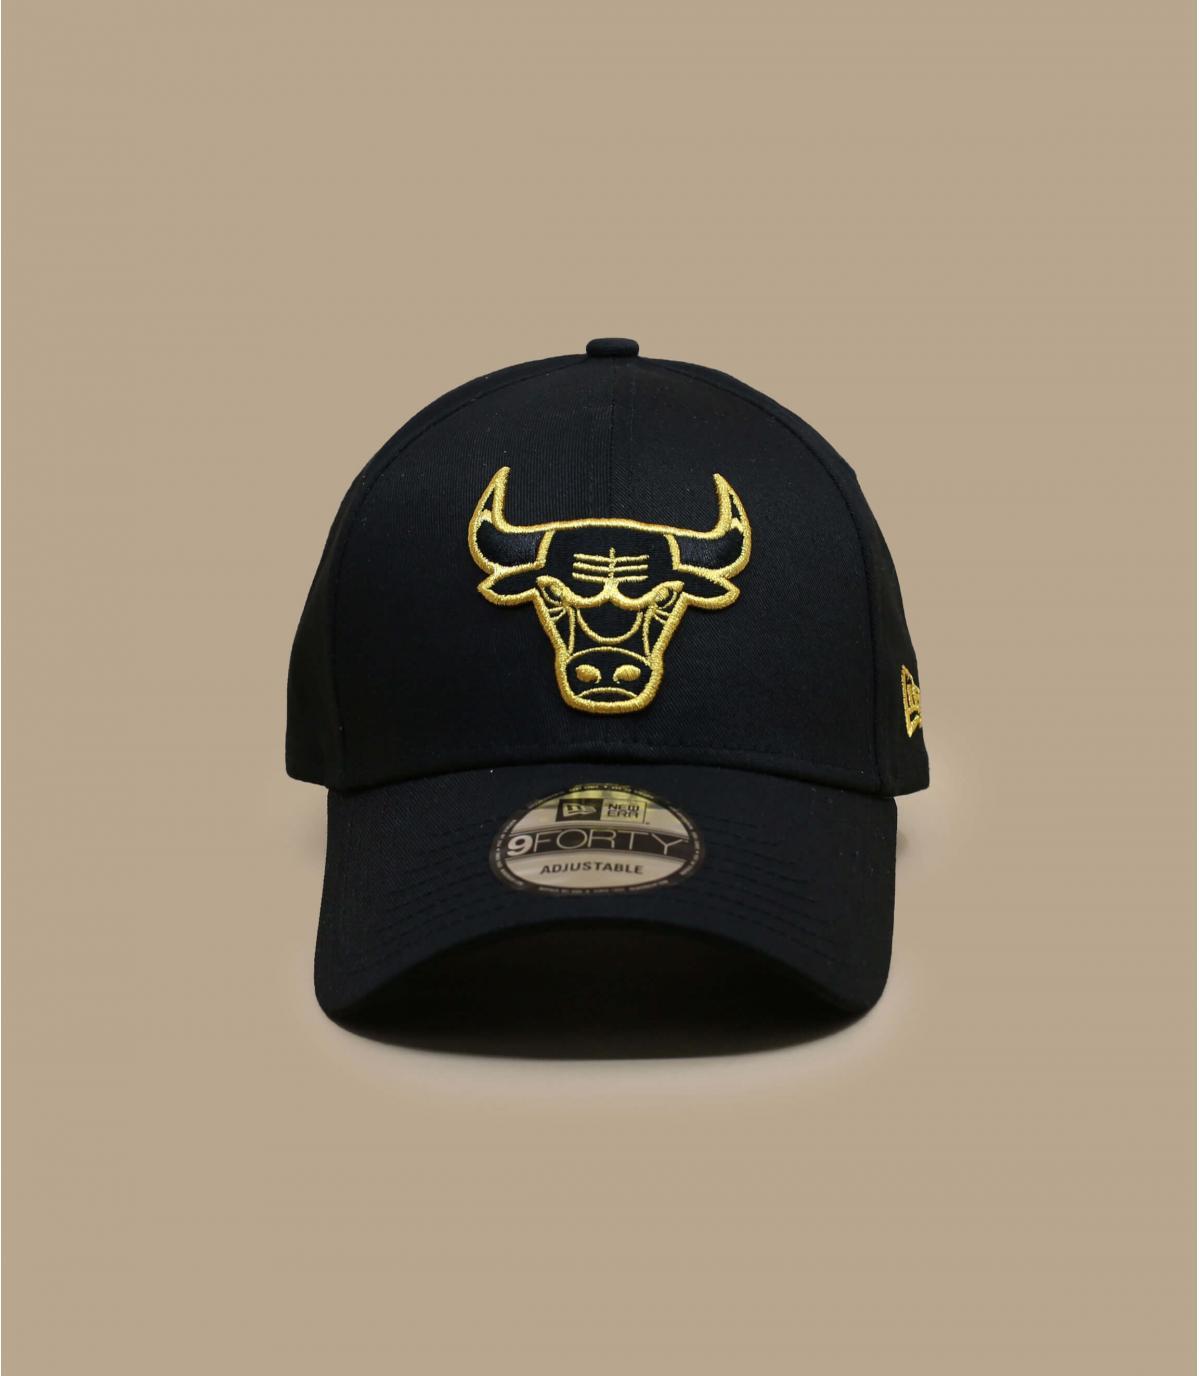 casquette Bulls noir or